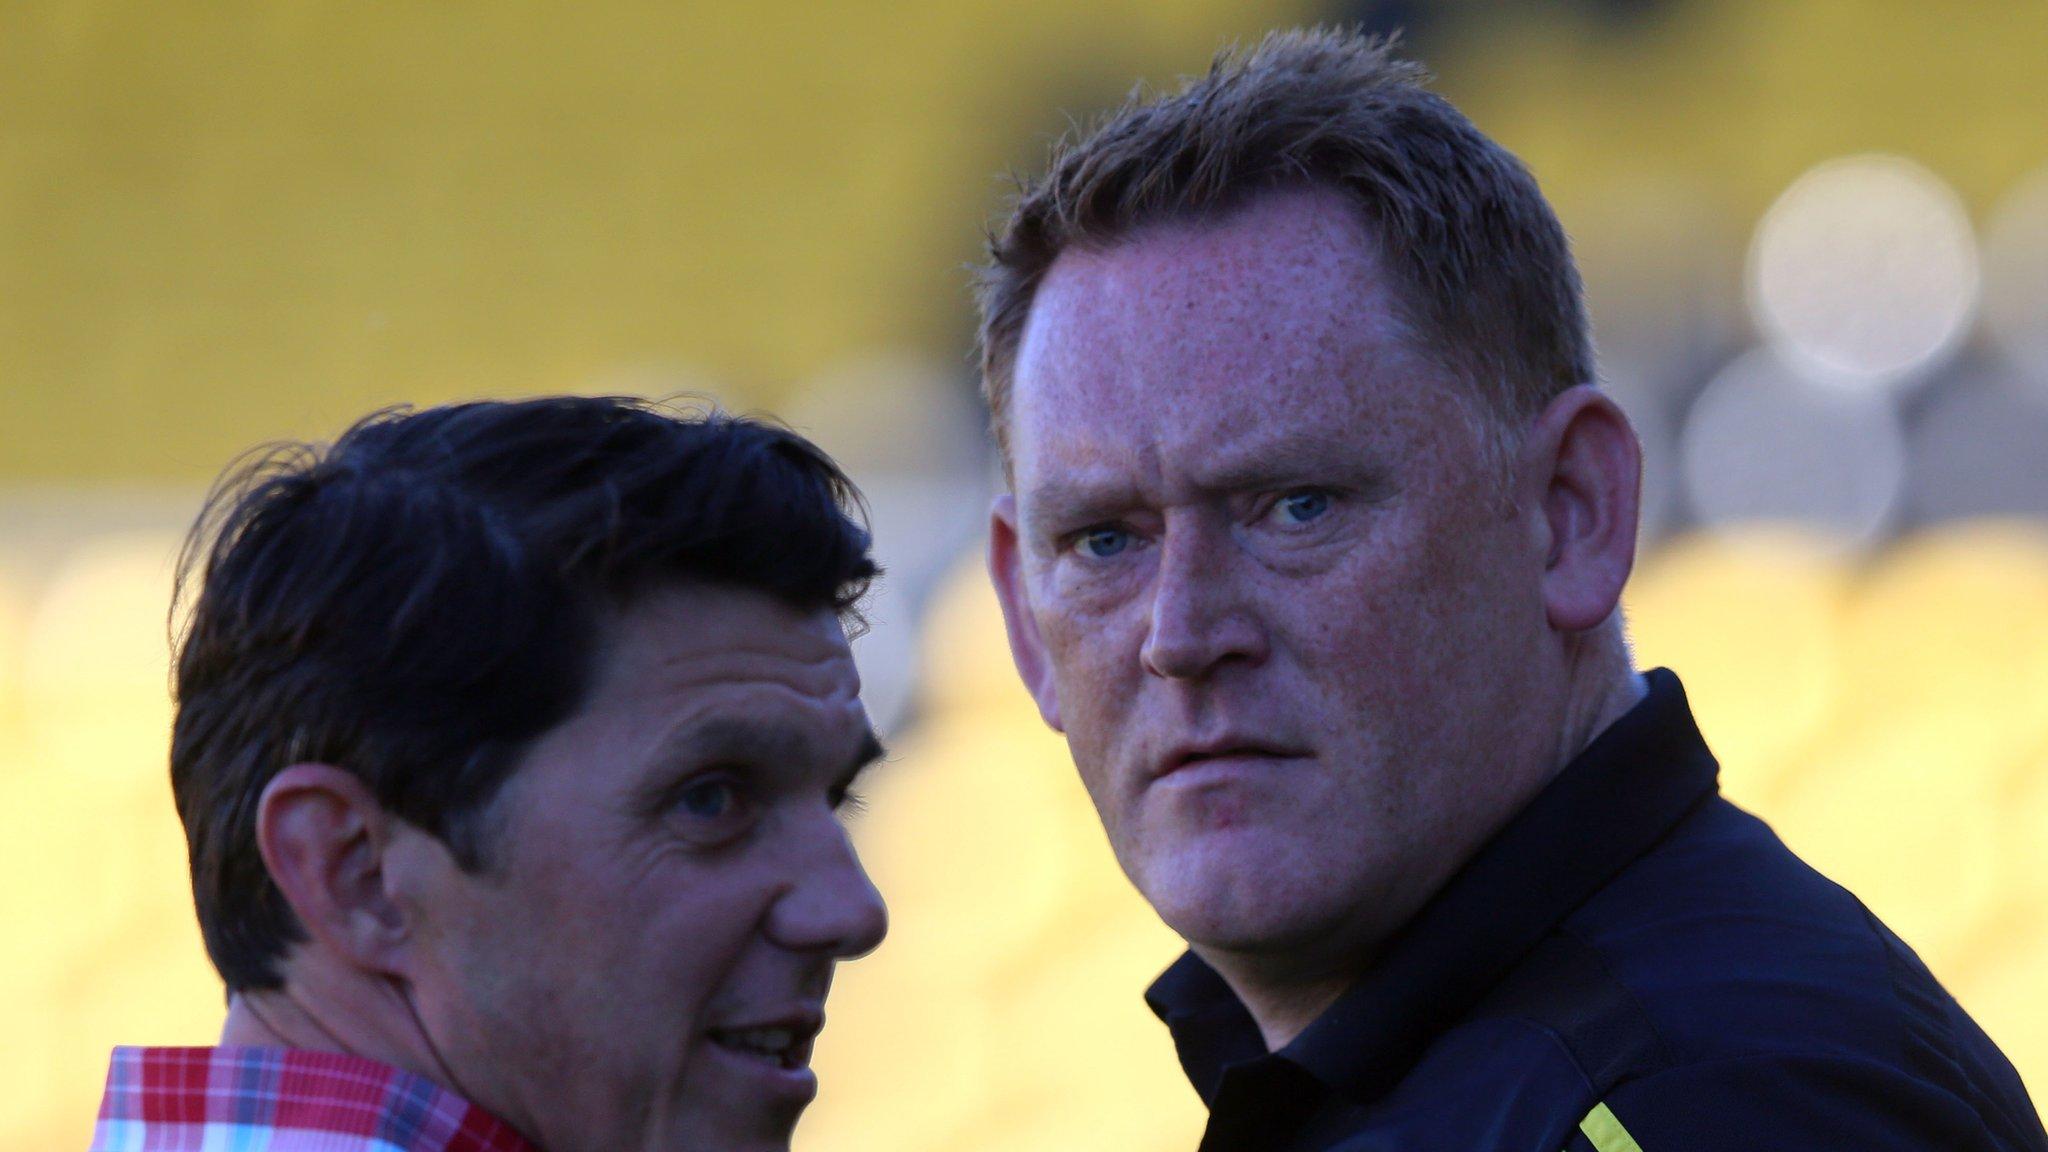 Hopkin becomes Bradford's fourth head coach in 2018